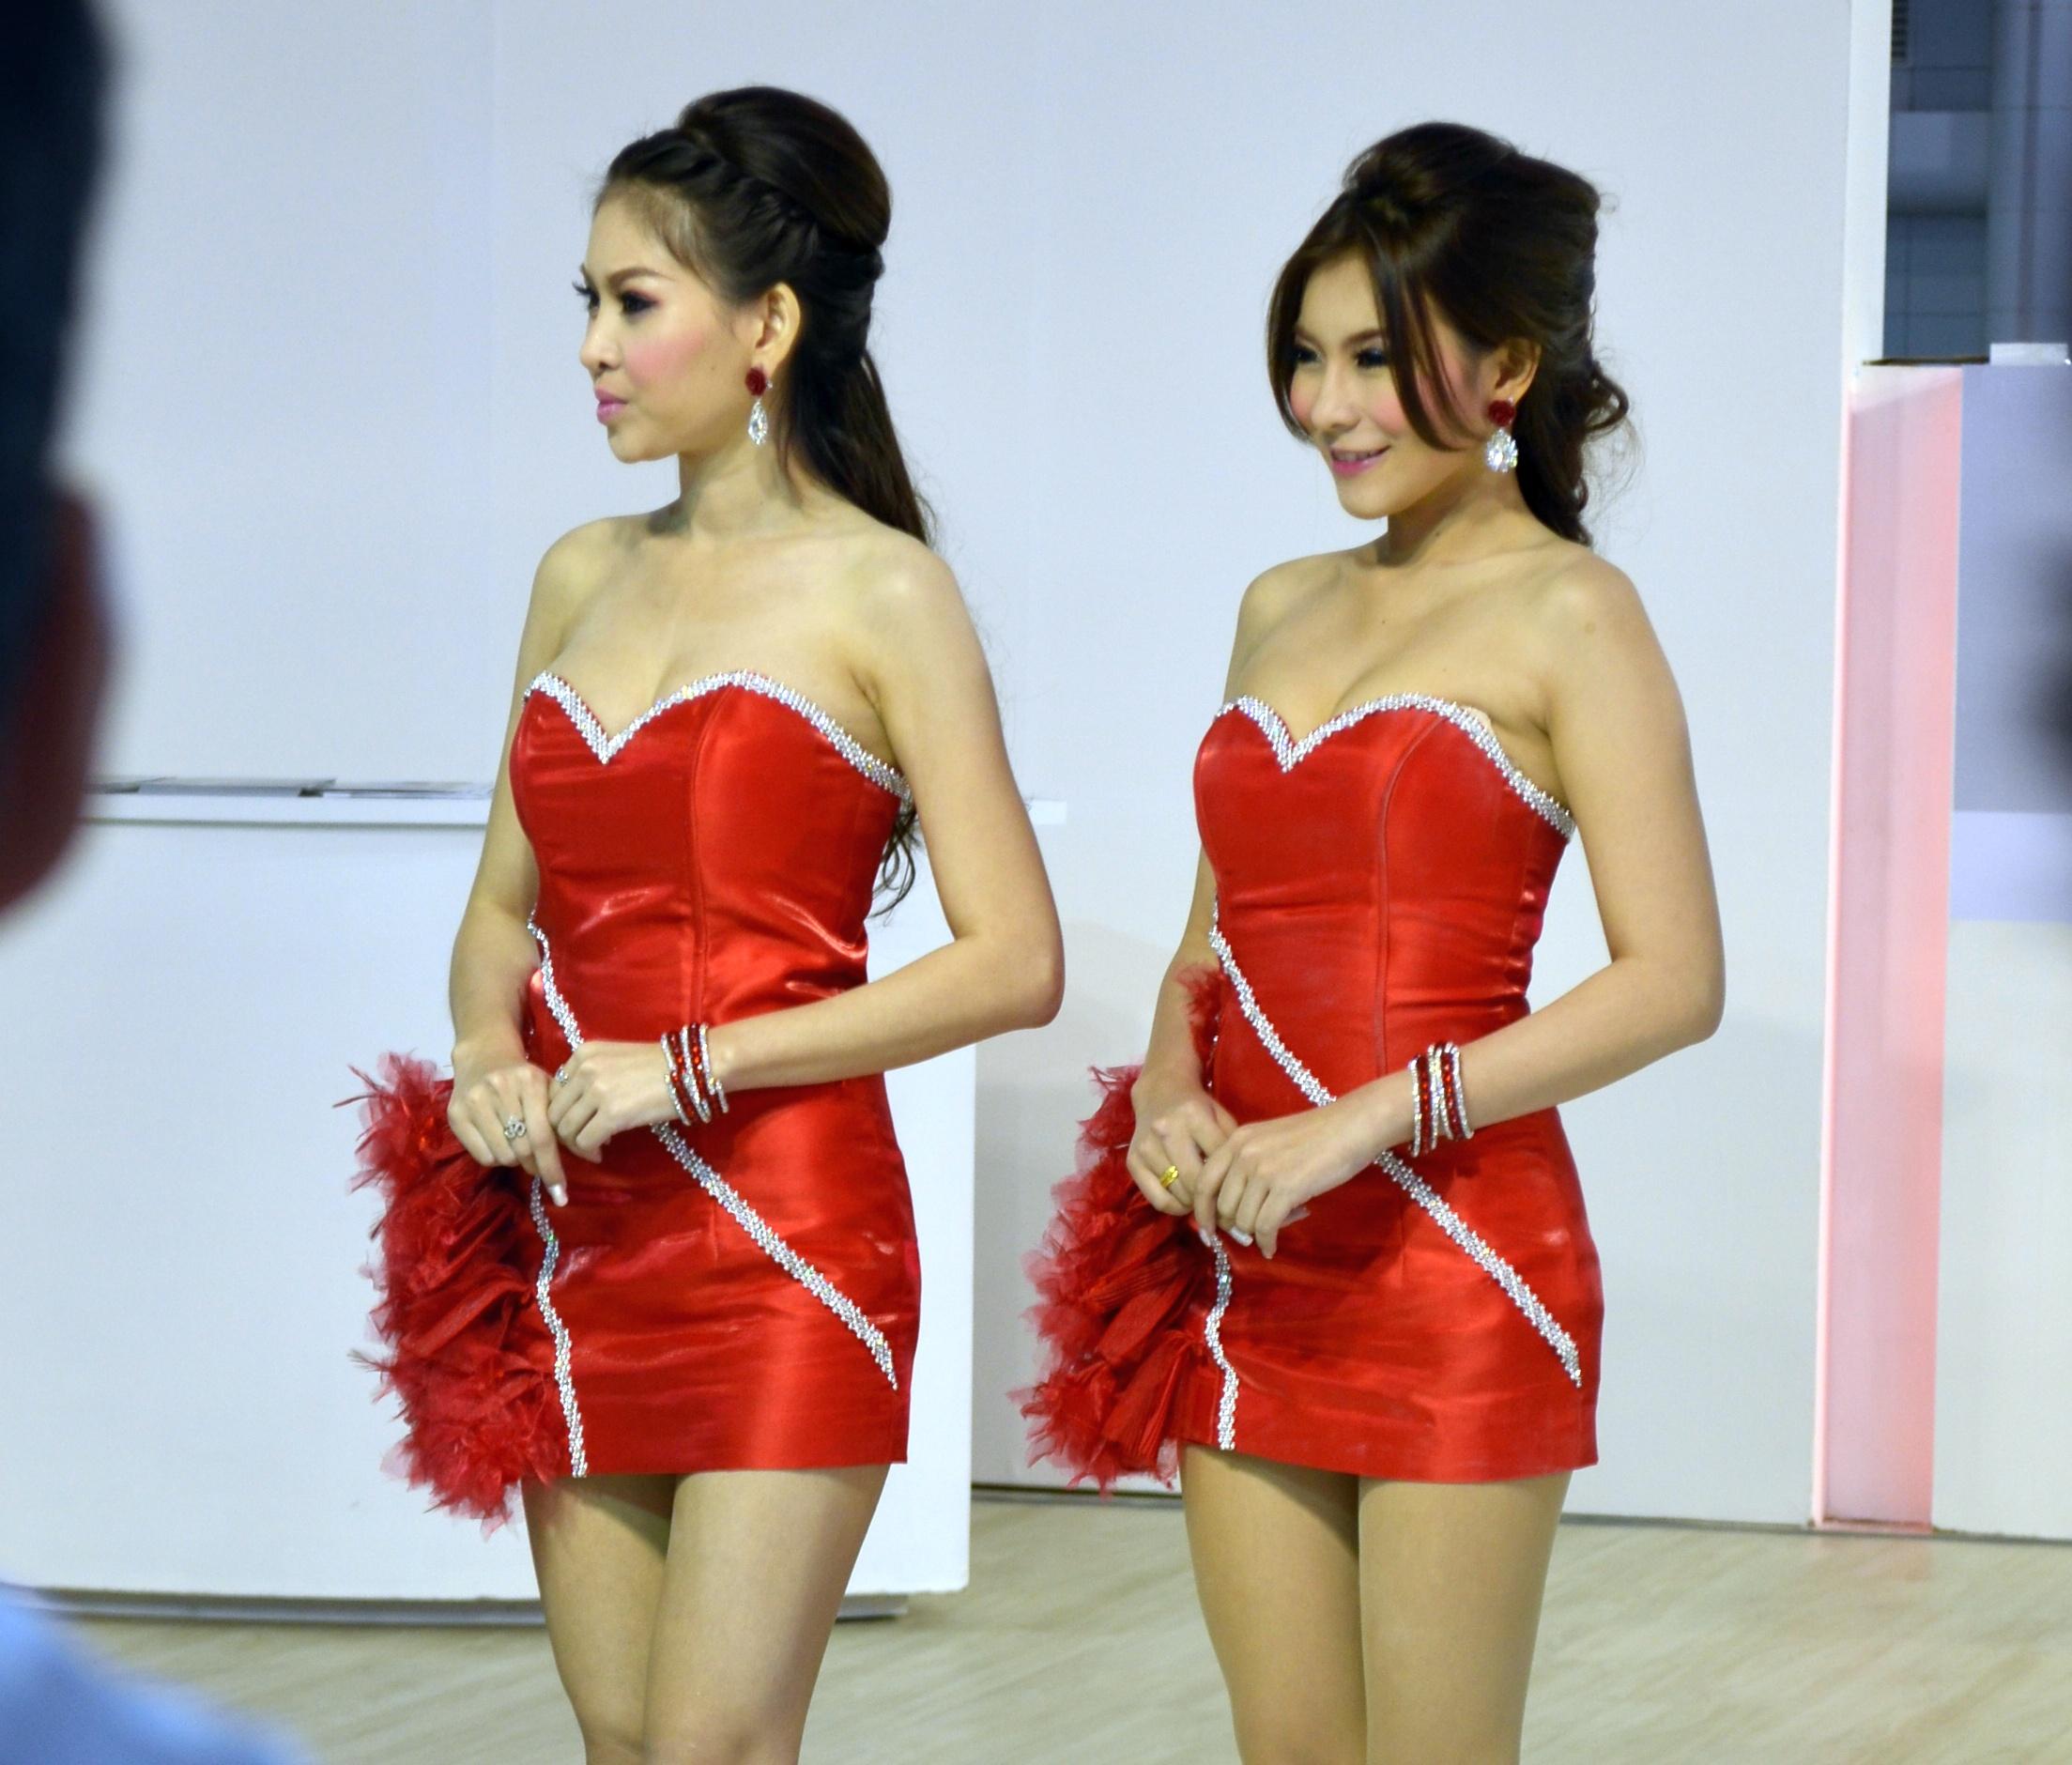 Фото женщин в тайланде 15 фотография